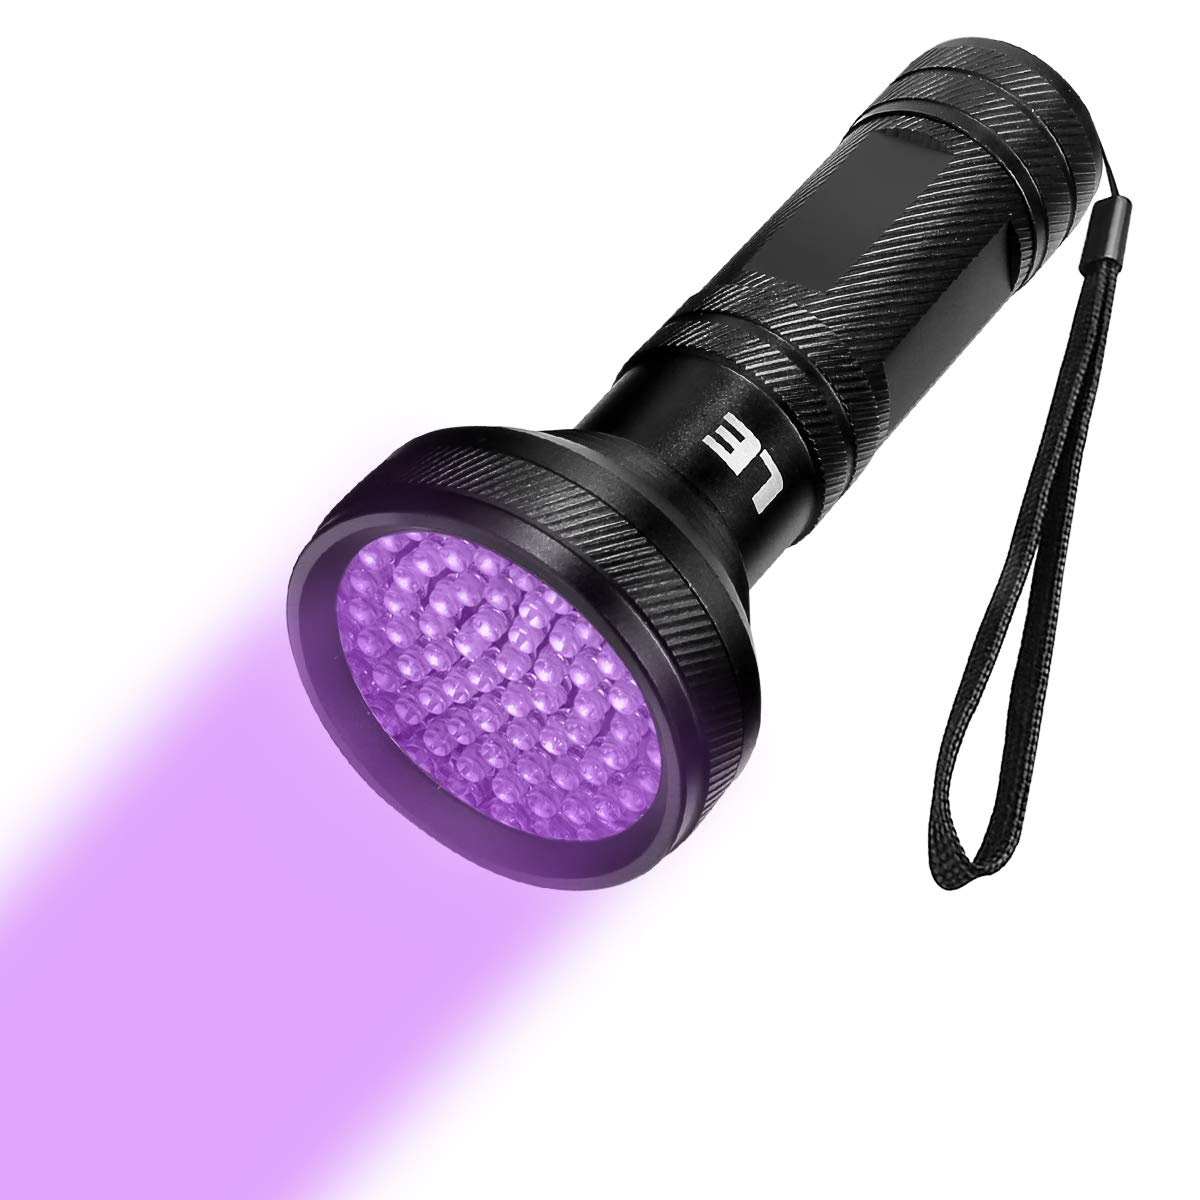 LE Linterna Ultravioleta, 68 LED Potente, Luz Negra 395nm, Linterna UV, Correa Incluida